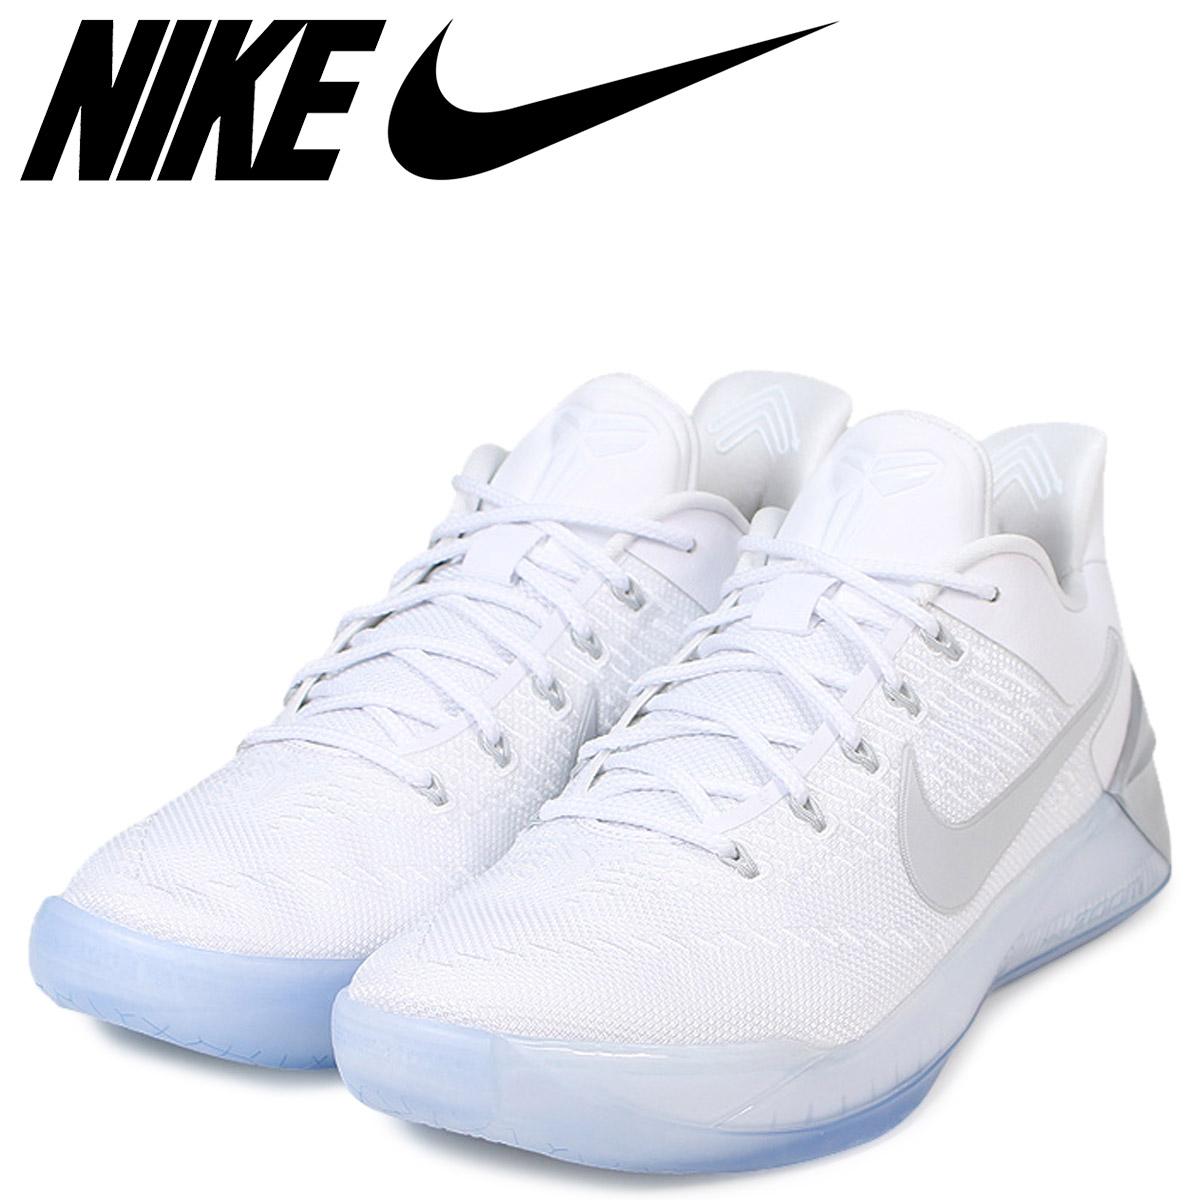 wholesale dealer b5ab8 93db9 Nike NIKE Corby sneakers KOBE A.D. WHITE CHROME men 852,425-110 Kobe Bryant  white